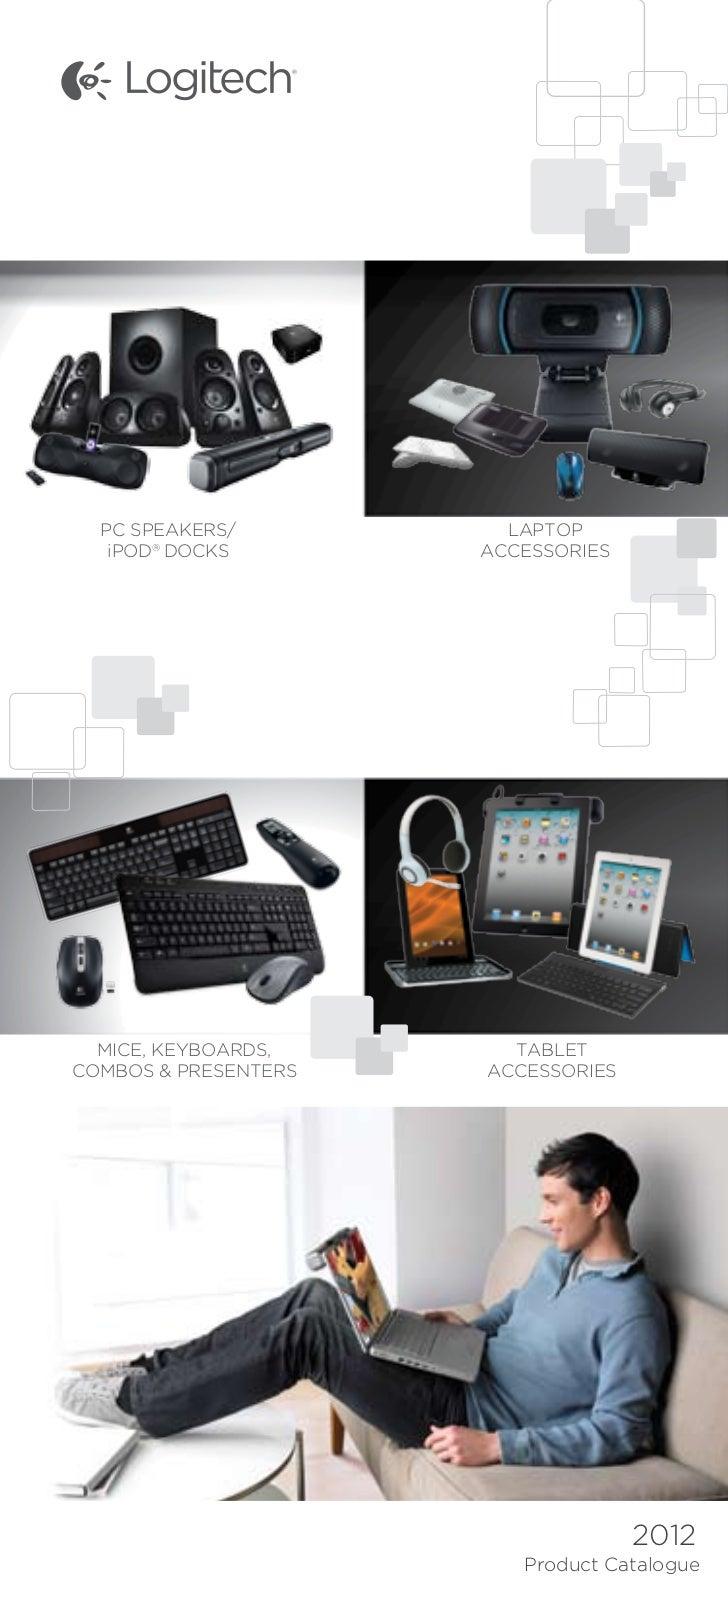 PC SPEAKERS/          LAPTOP   iPOD® DOCKS        ACCESSORIES  MICE, KEYBOARDS,      TABLETCOMBOS & PRESENTERS   ACCESSORI...